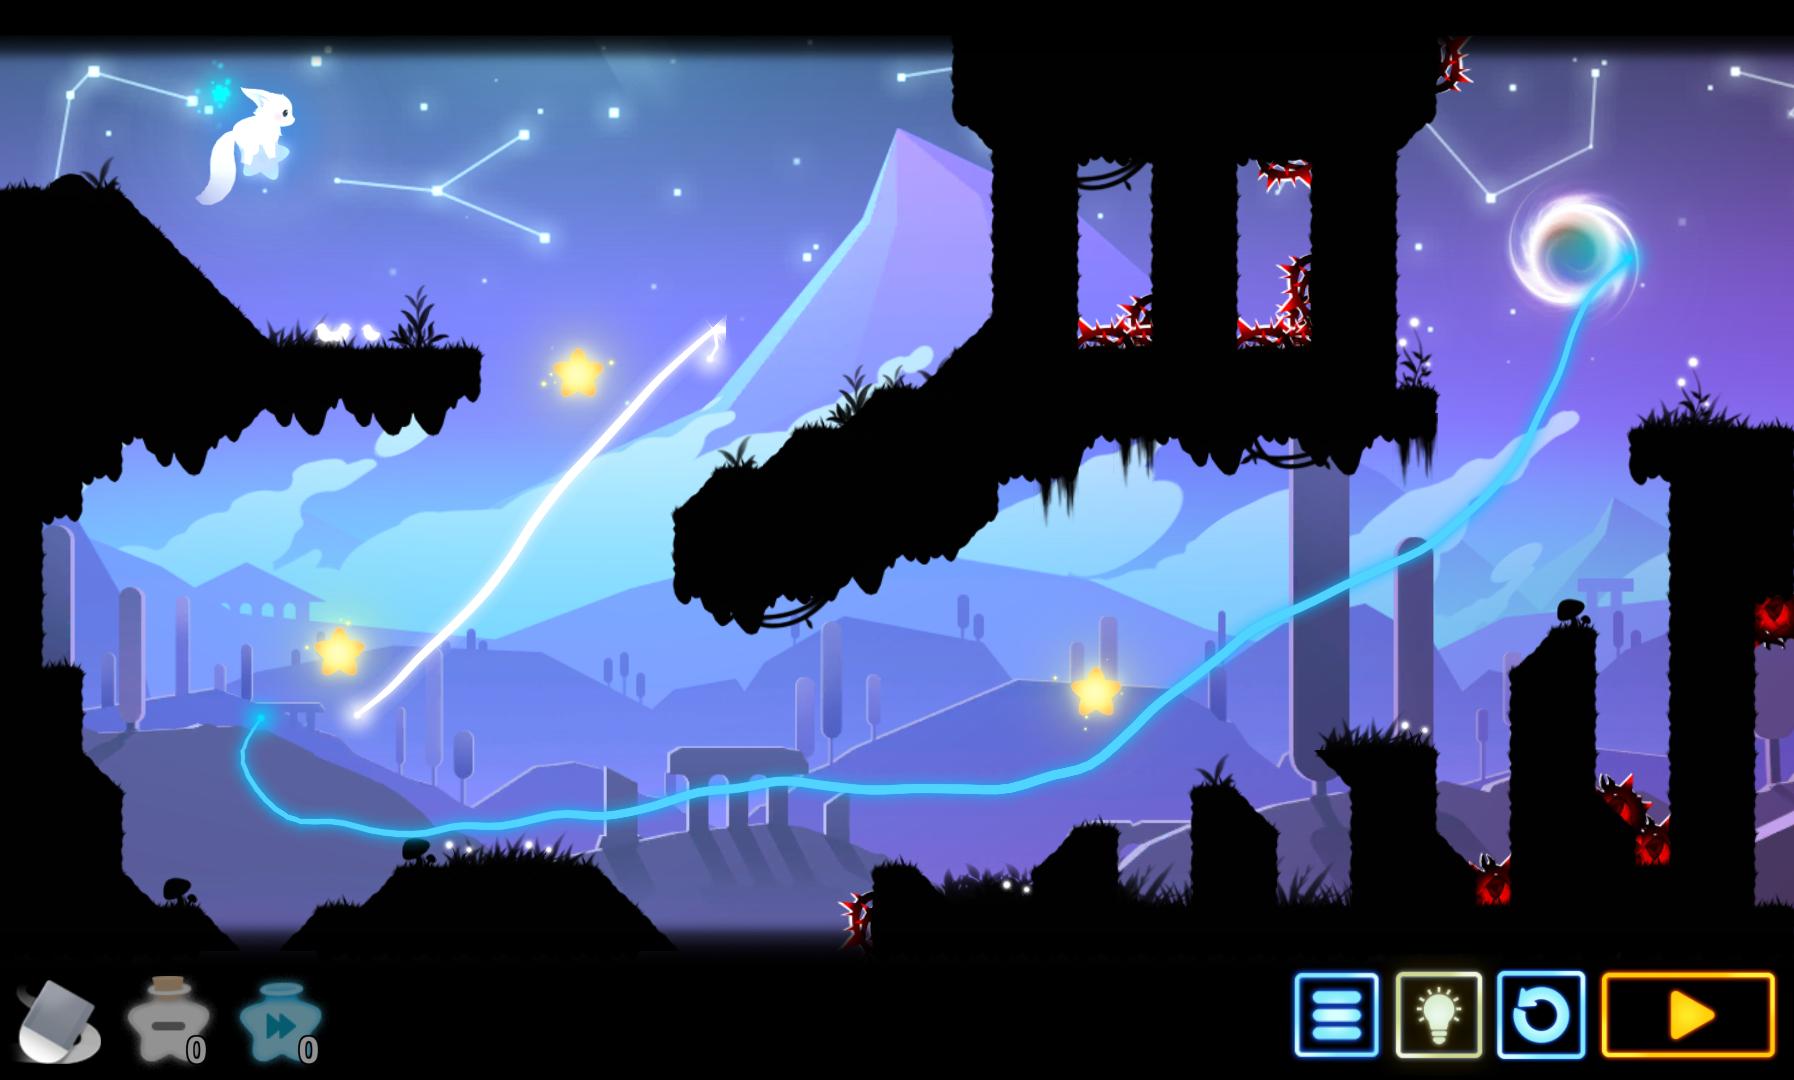 STELLAR FOX androidアプリスクリーンショット1